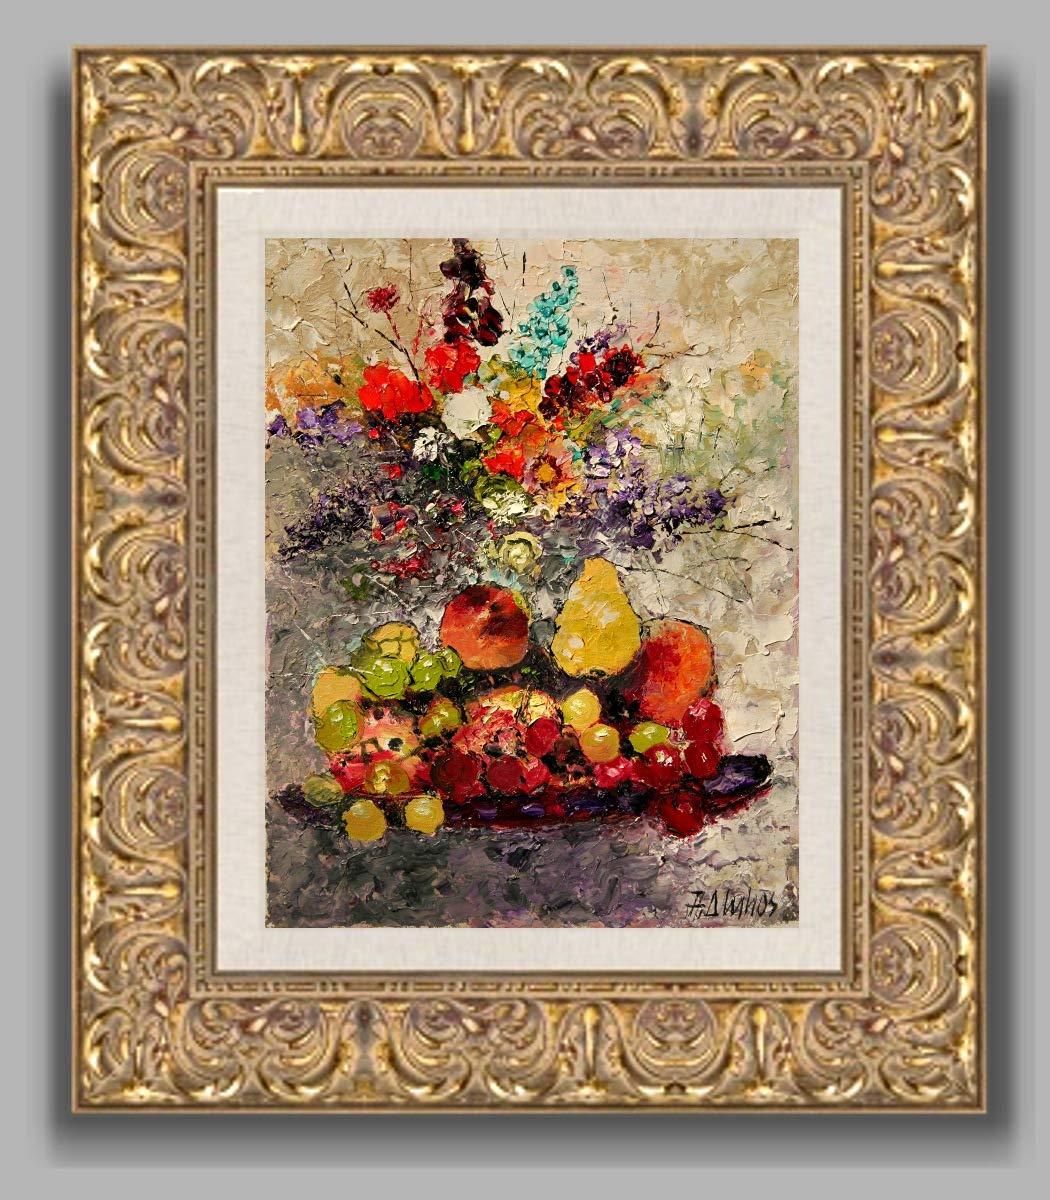 The Still Life fruit and flower still life by internationally renown painter Andre Dluhos